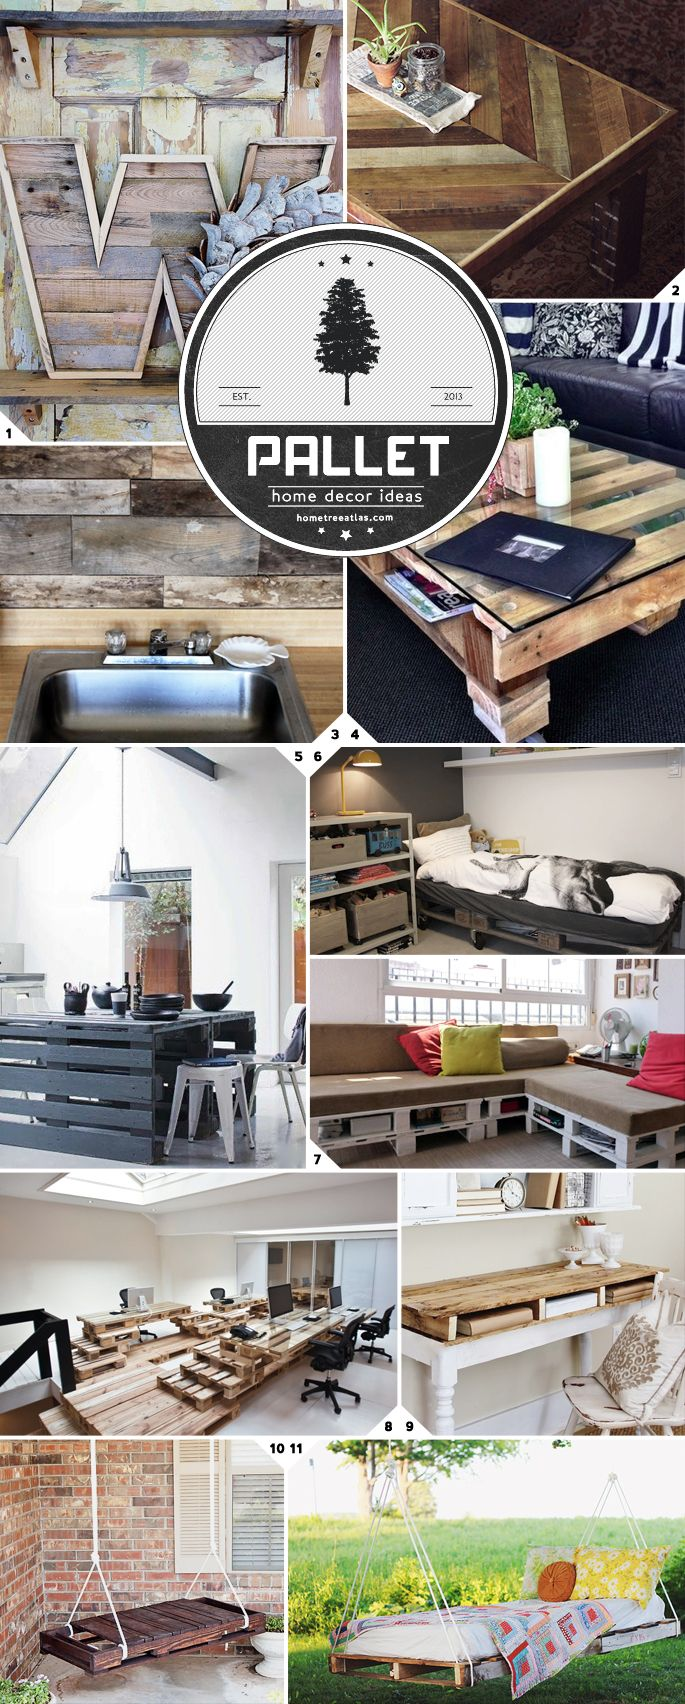 Home Decor Ideas: Using Pallets